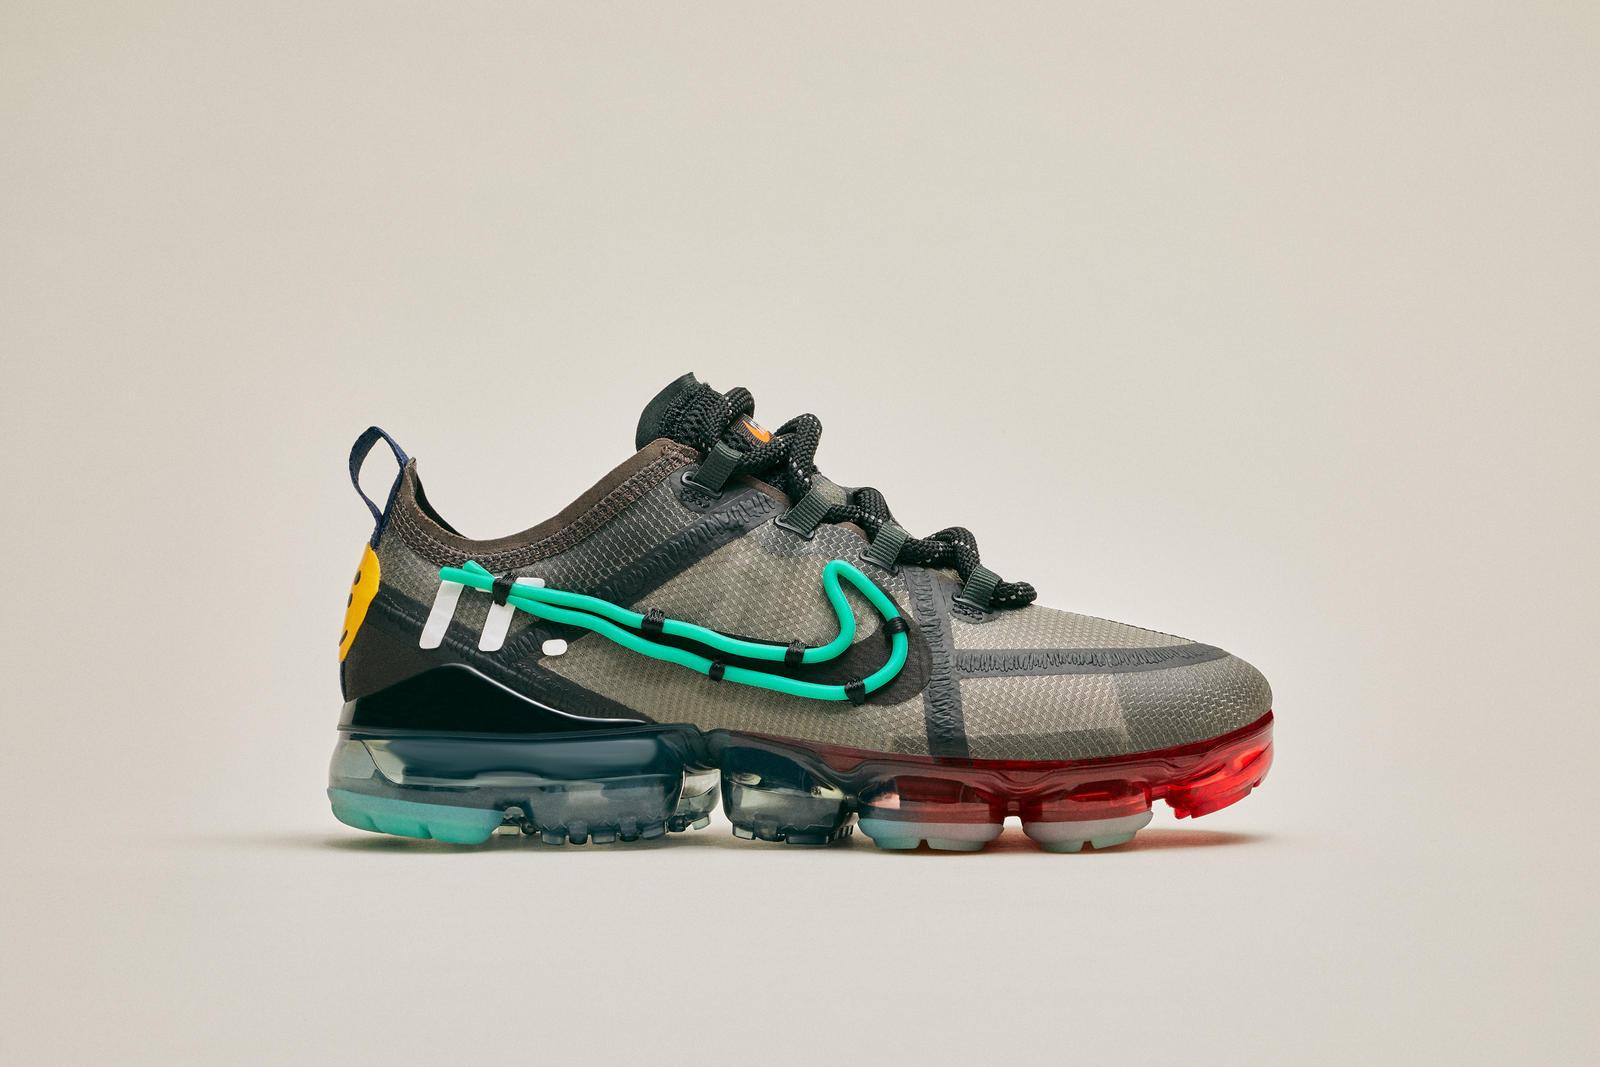 Nike Air Max 2019 Collaborations — atmos CLOT Heron Preston